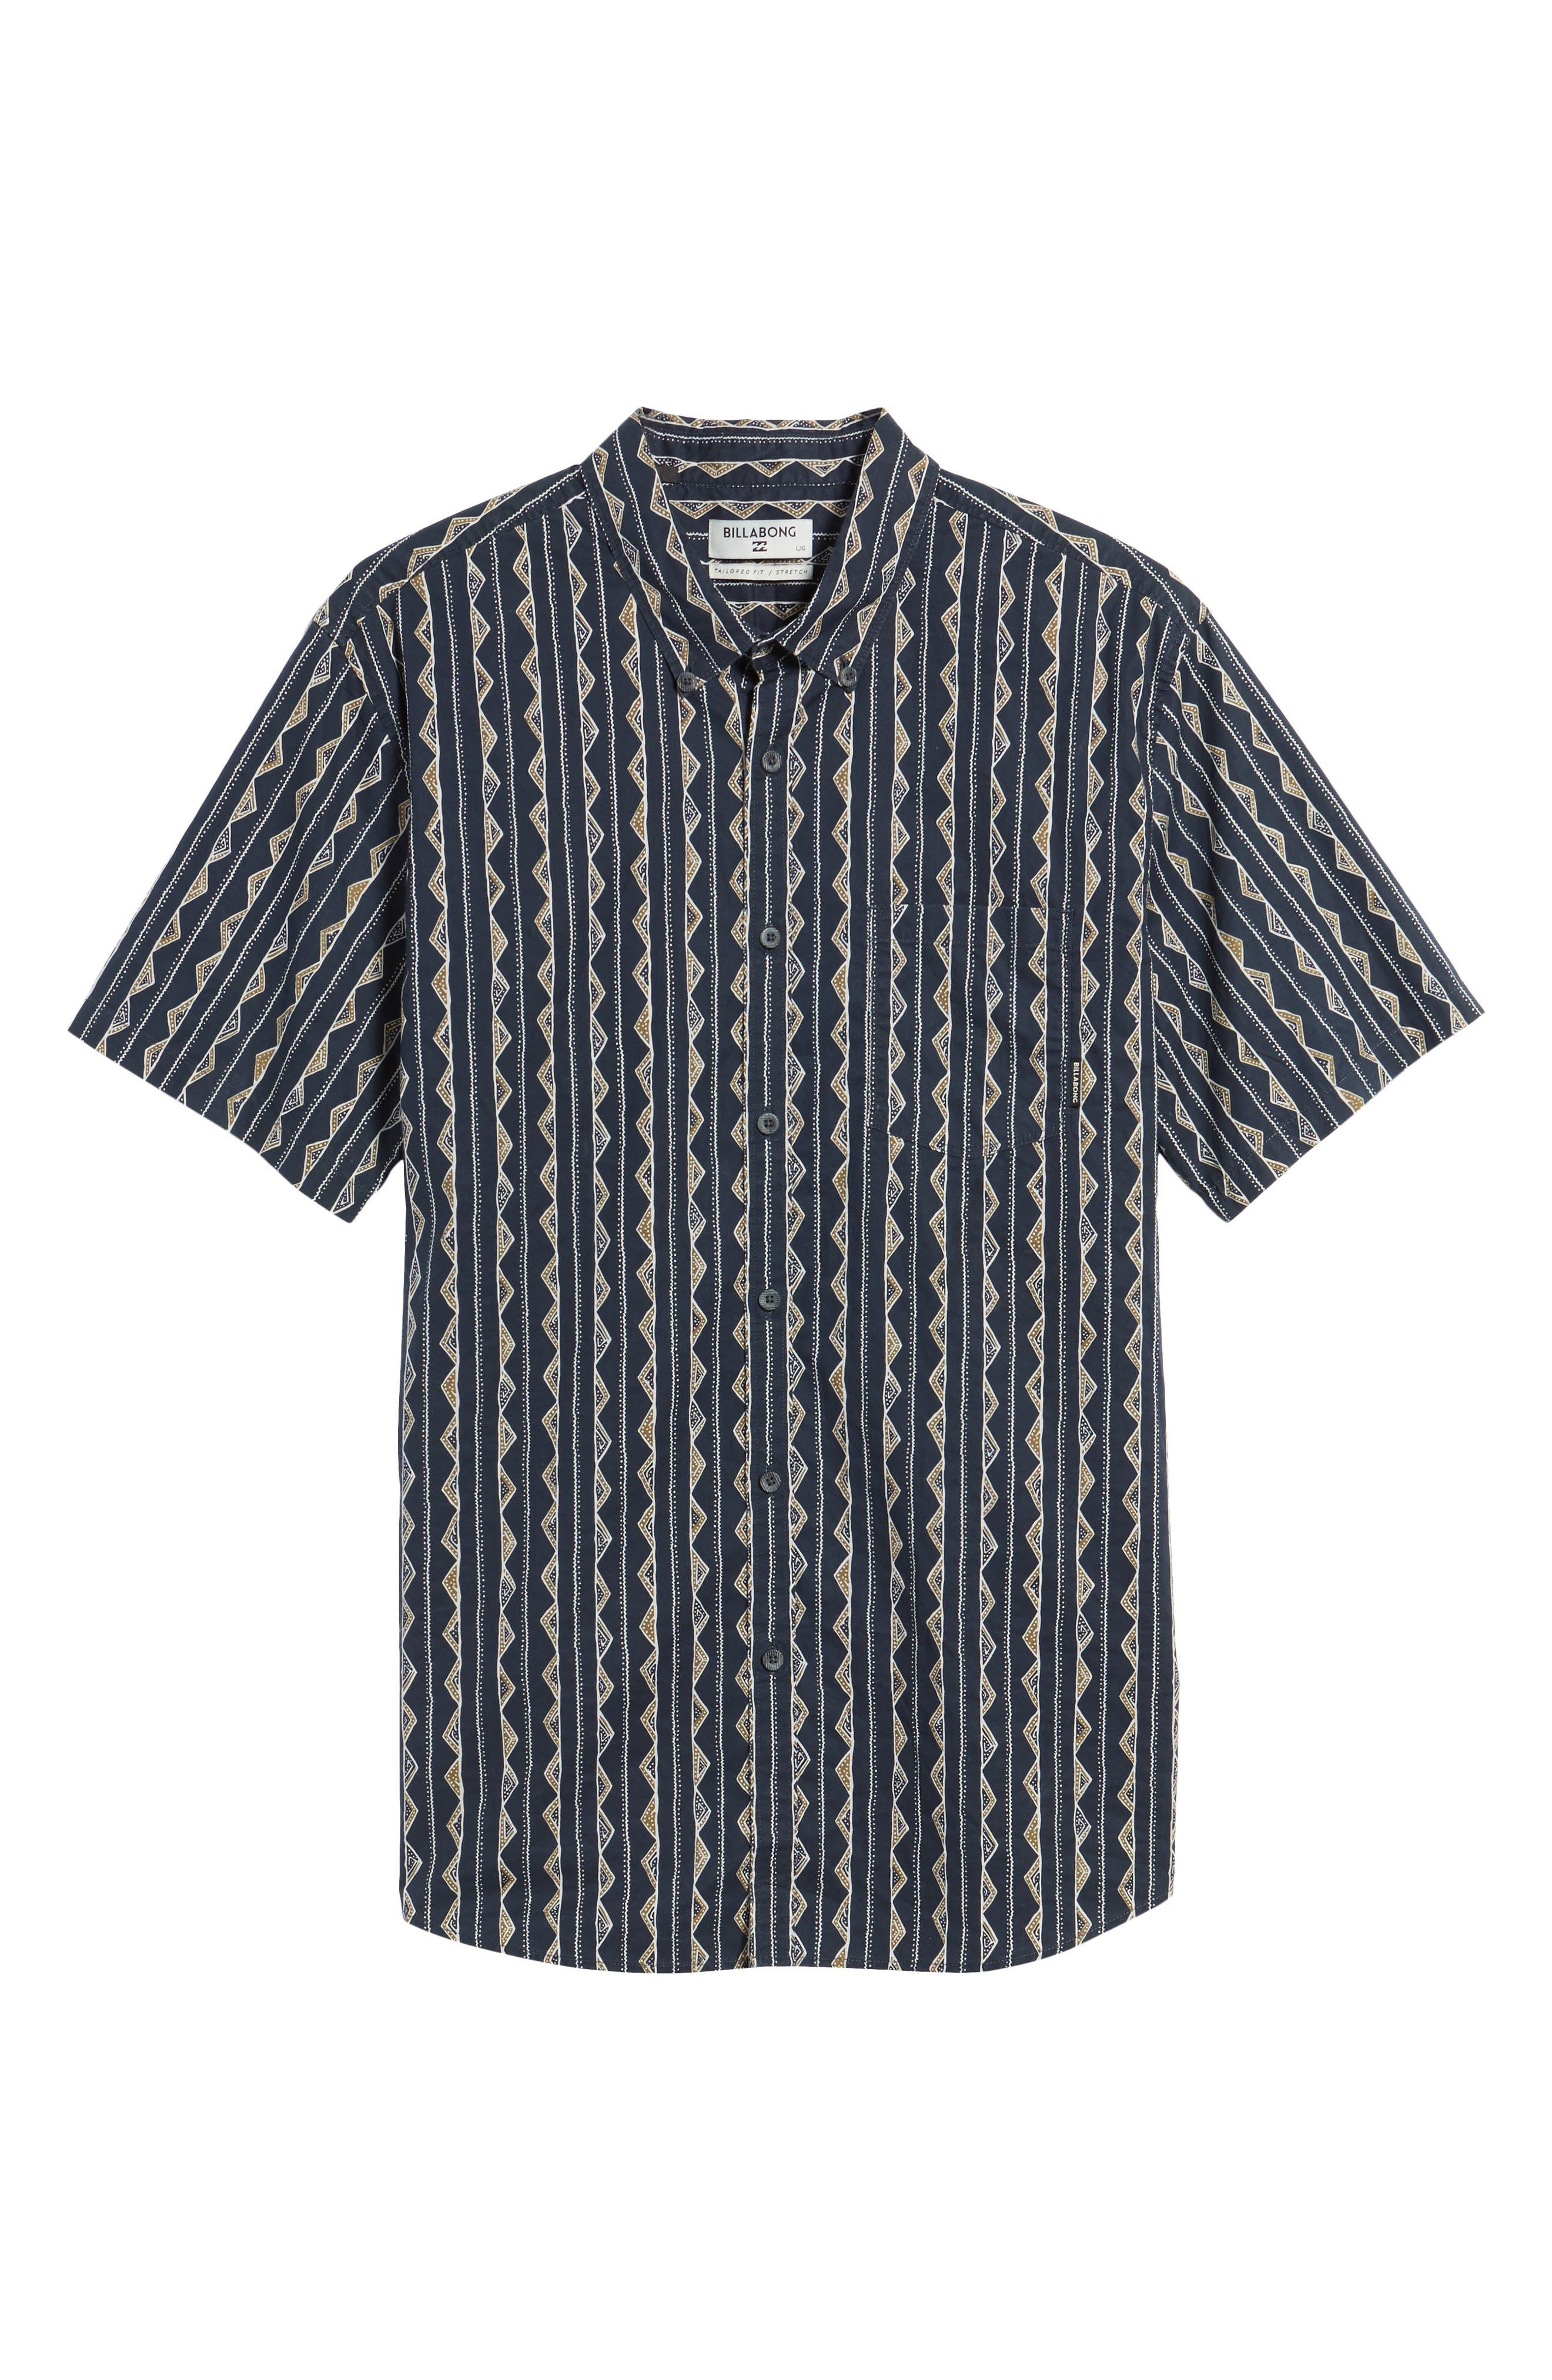 Sundays Sport Shirt,                             Alternate thumbnail 6, color,                             Navy